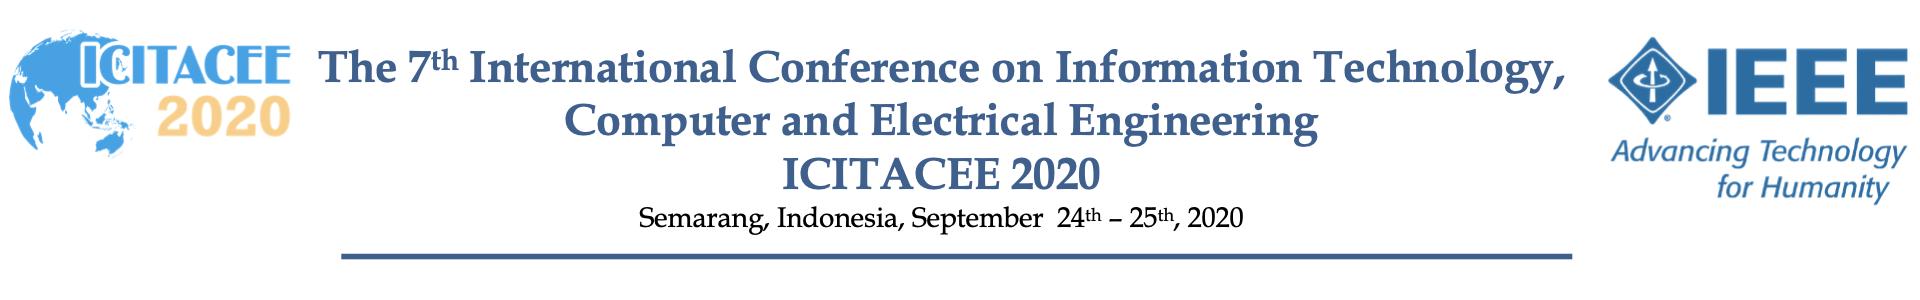 2020 7th ICITACEE